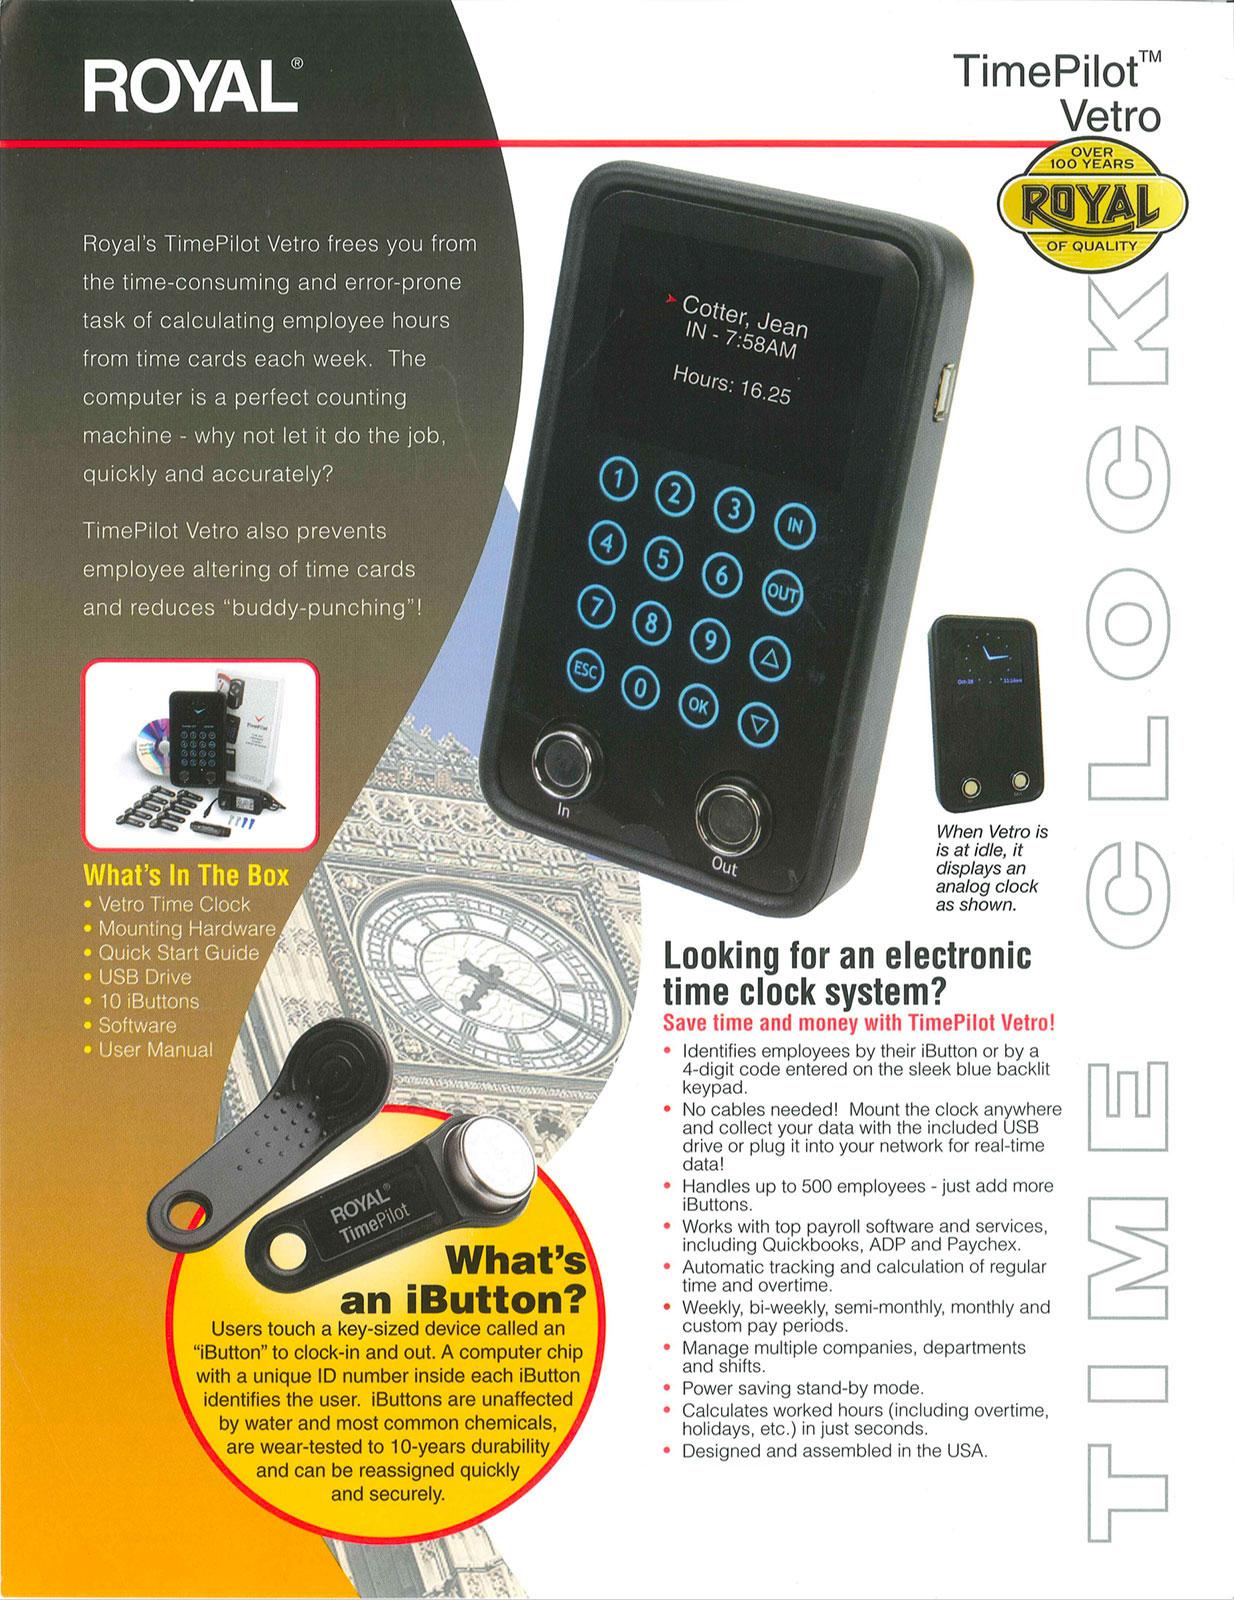 TimePilot Vetro